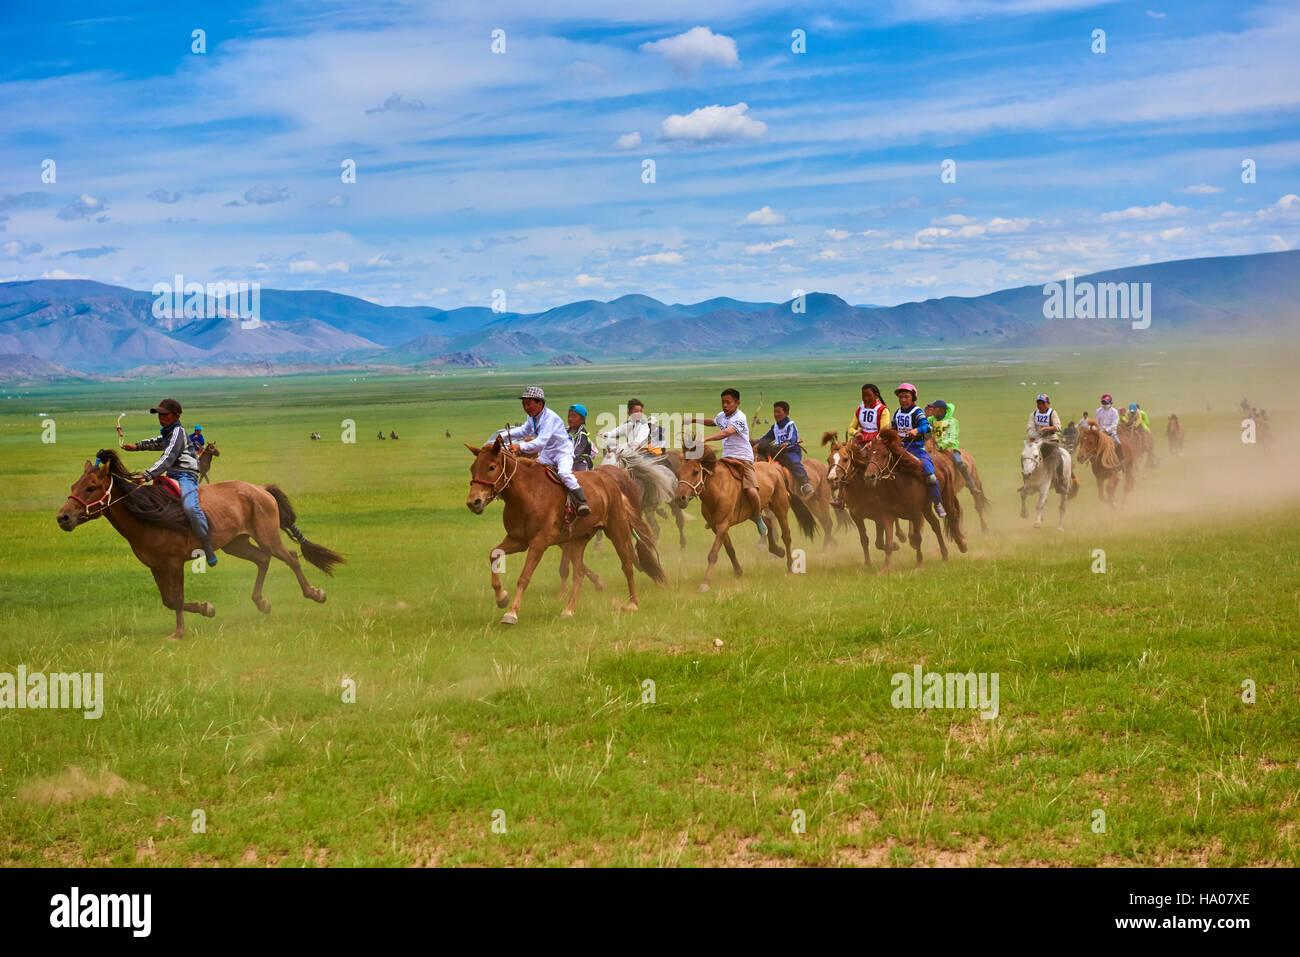 Mongolei, Bayankhongor Provinz, Naadam, traditionelle Festivals, Pferderennen Stockbild